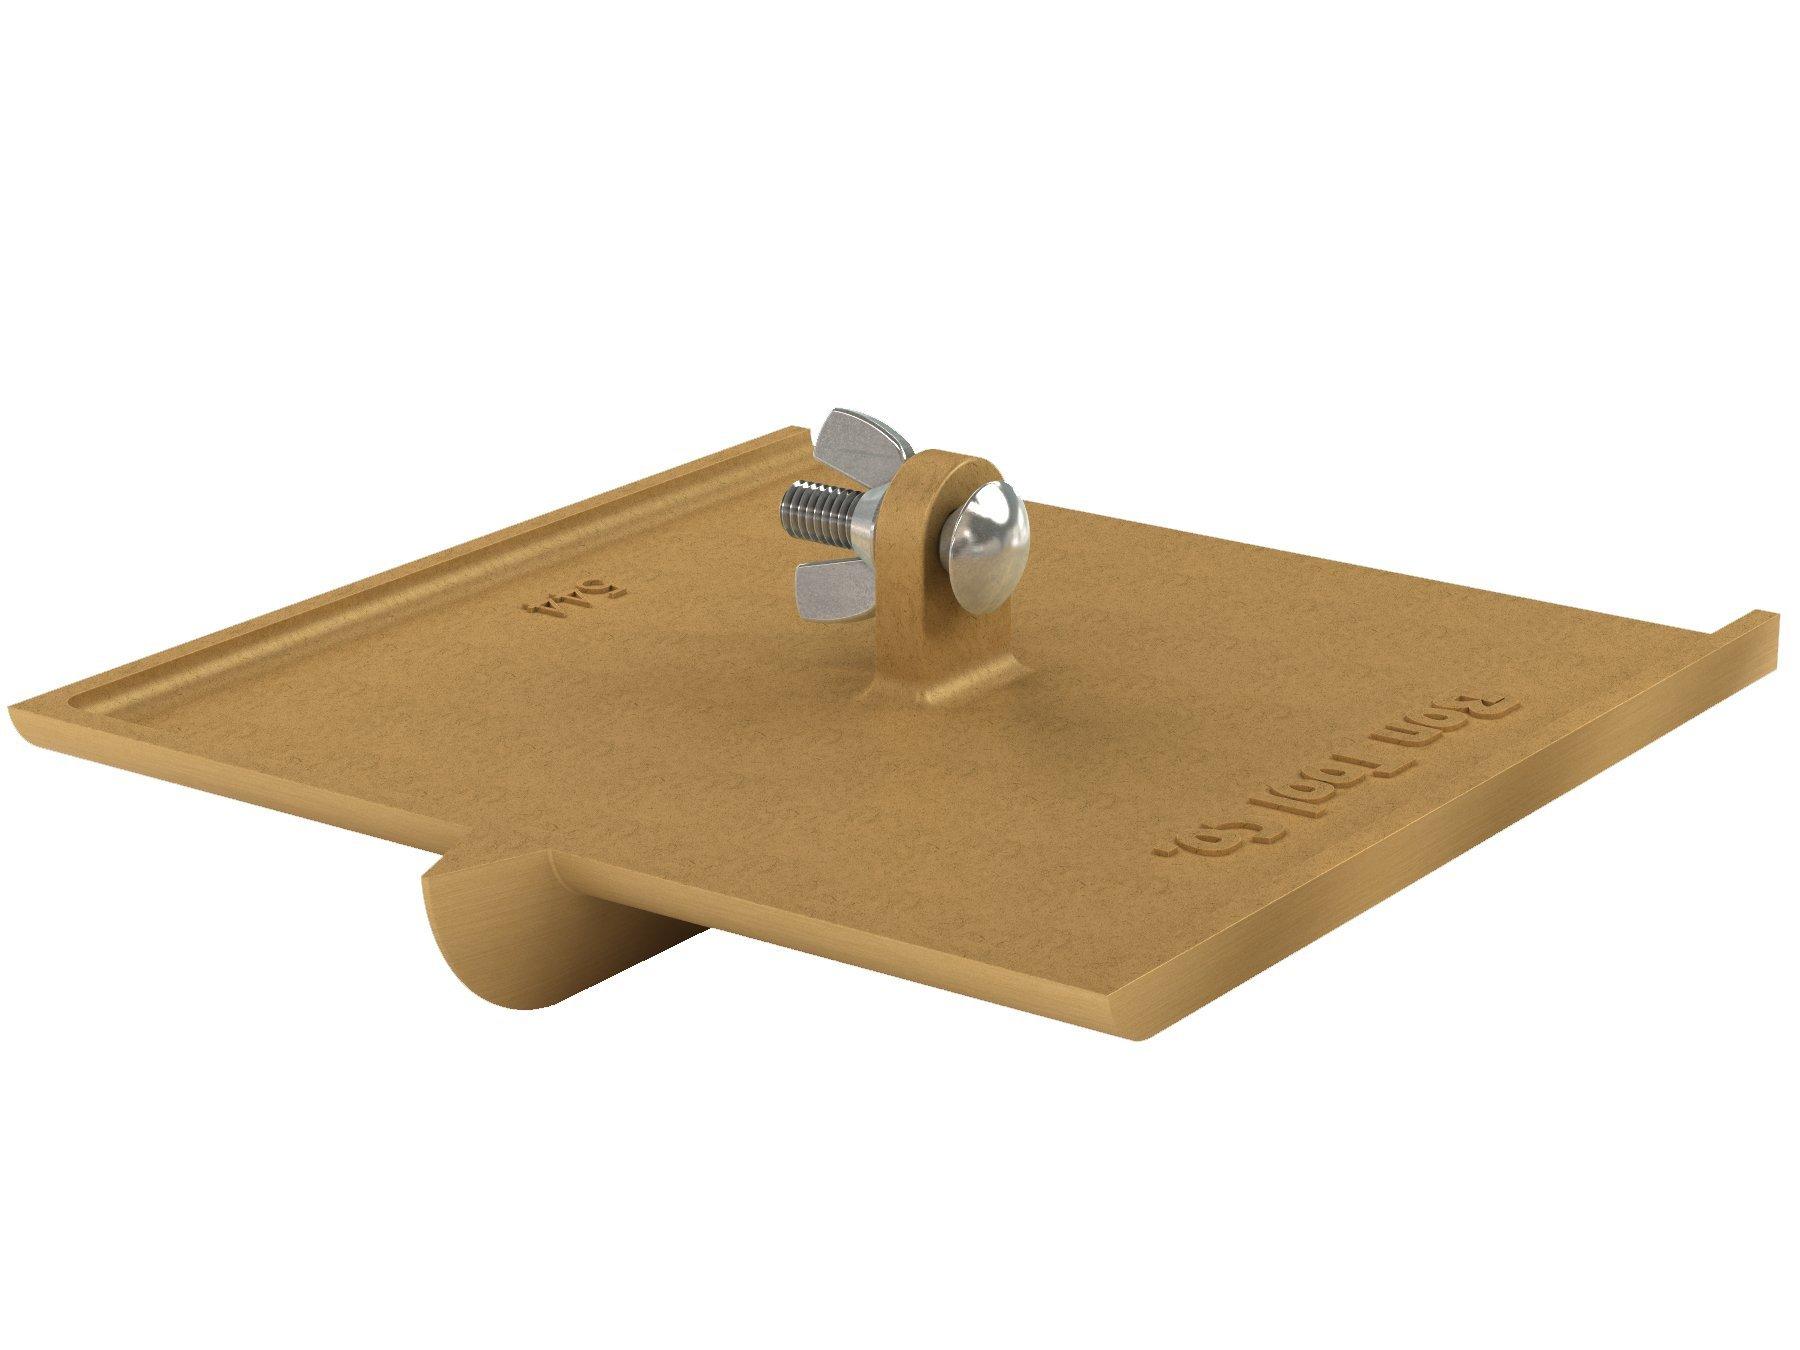 Bon 12-542 3/4-Inch bit Depth by 1/4-Inch Width 8-Inch by 8-Inch Walking Concrete Groover, Bronze